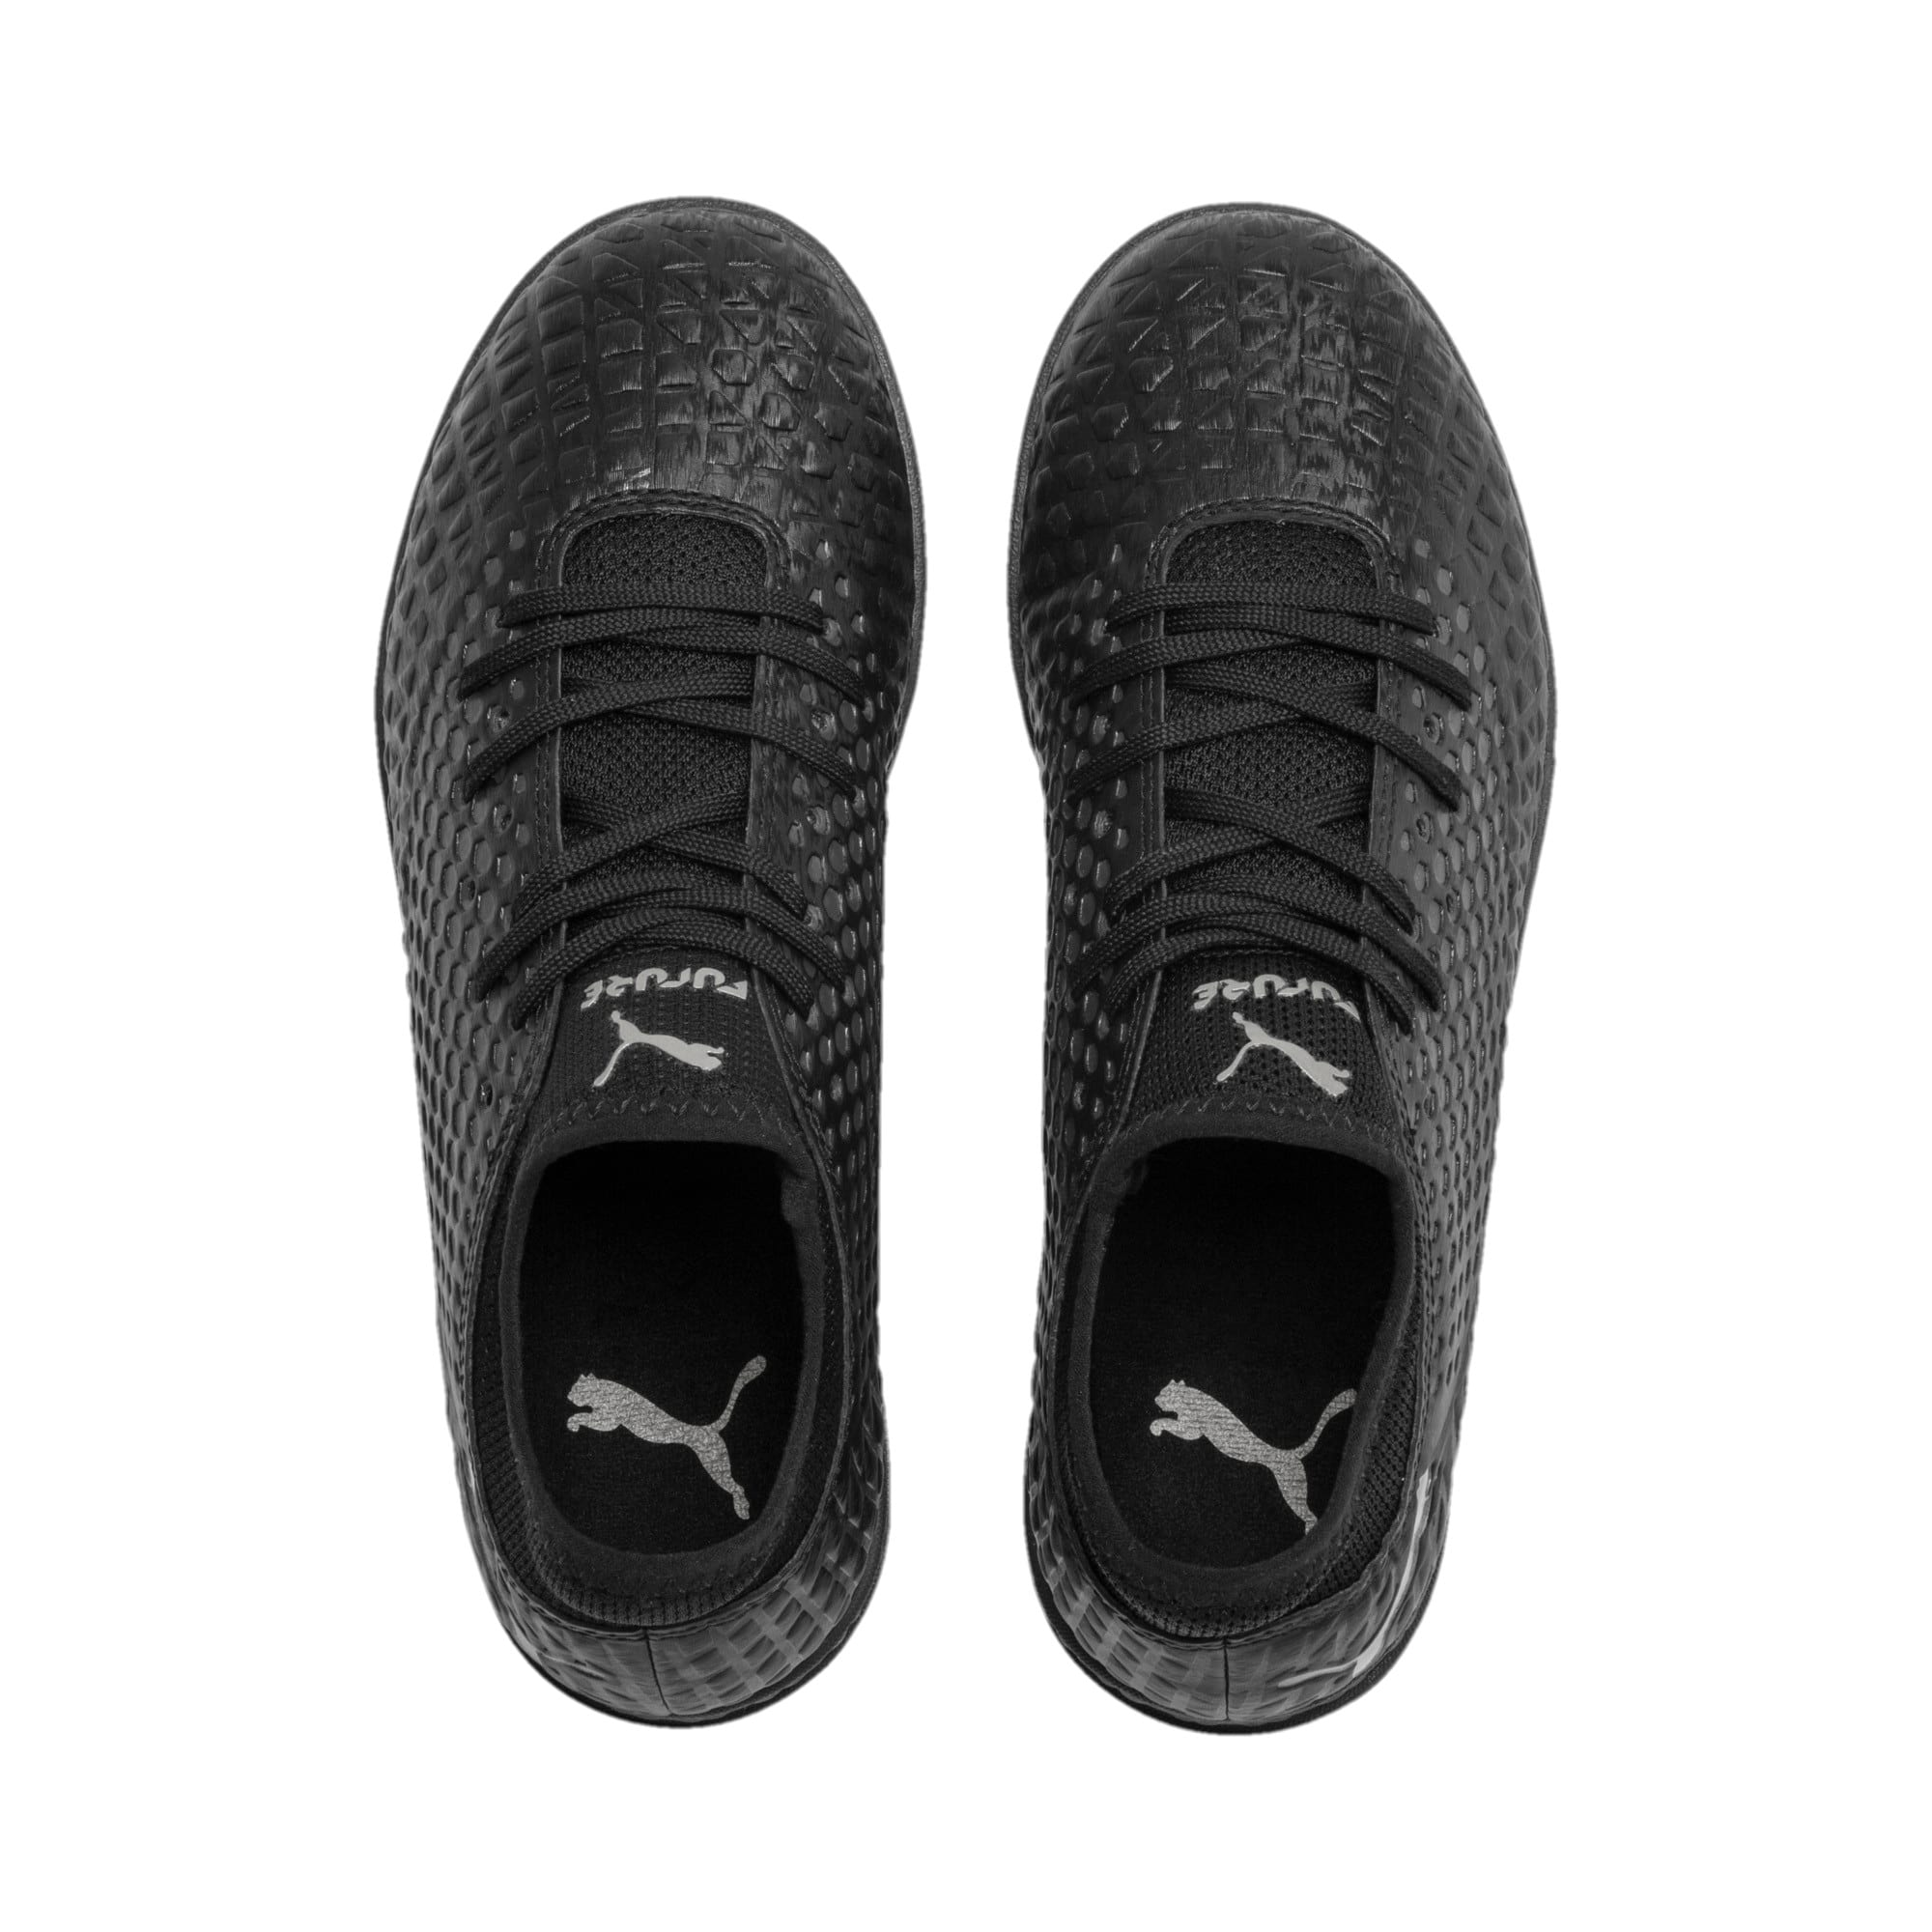 Imagen en miniatura 6 de Botas de fútbol de juvenil FUTURE 4.4 TT, Black-Black-Puma Aged Silver, mediana